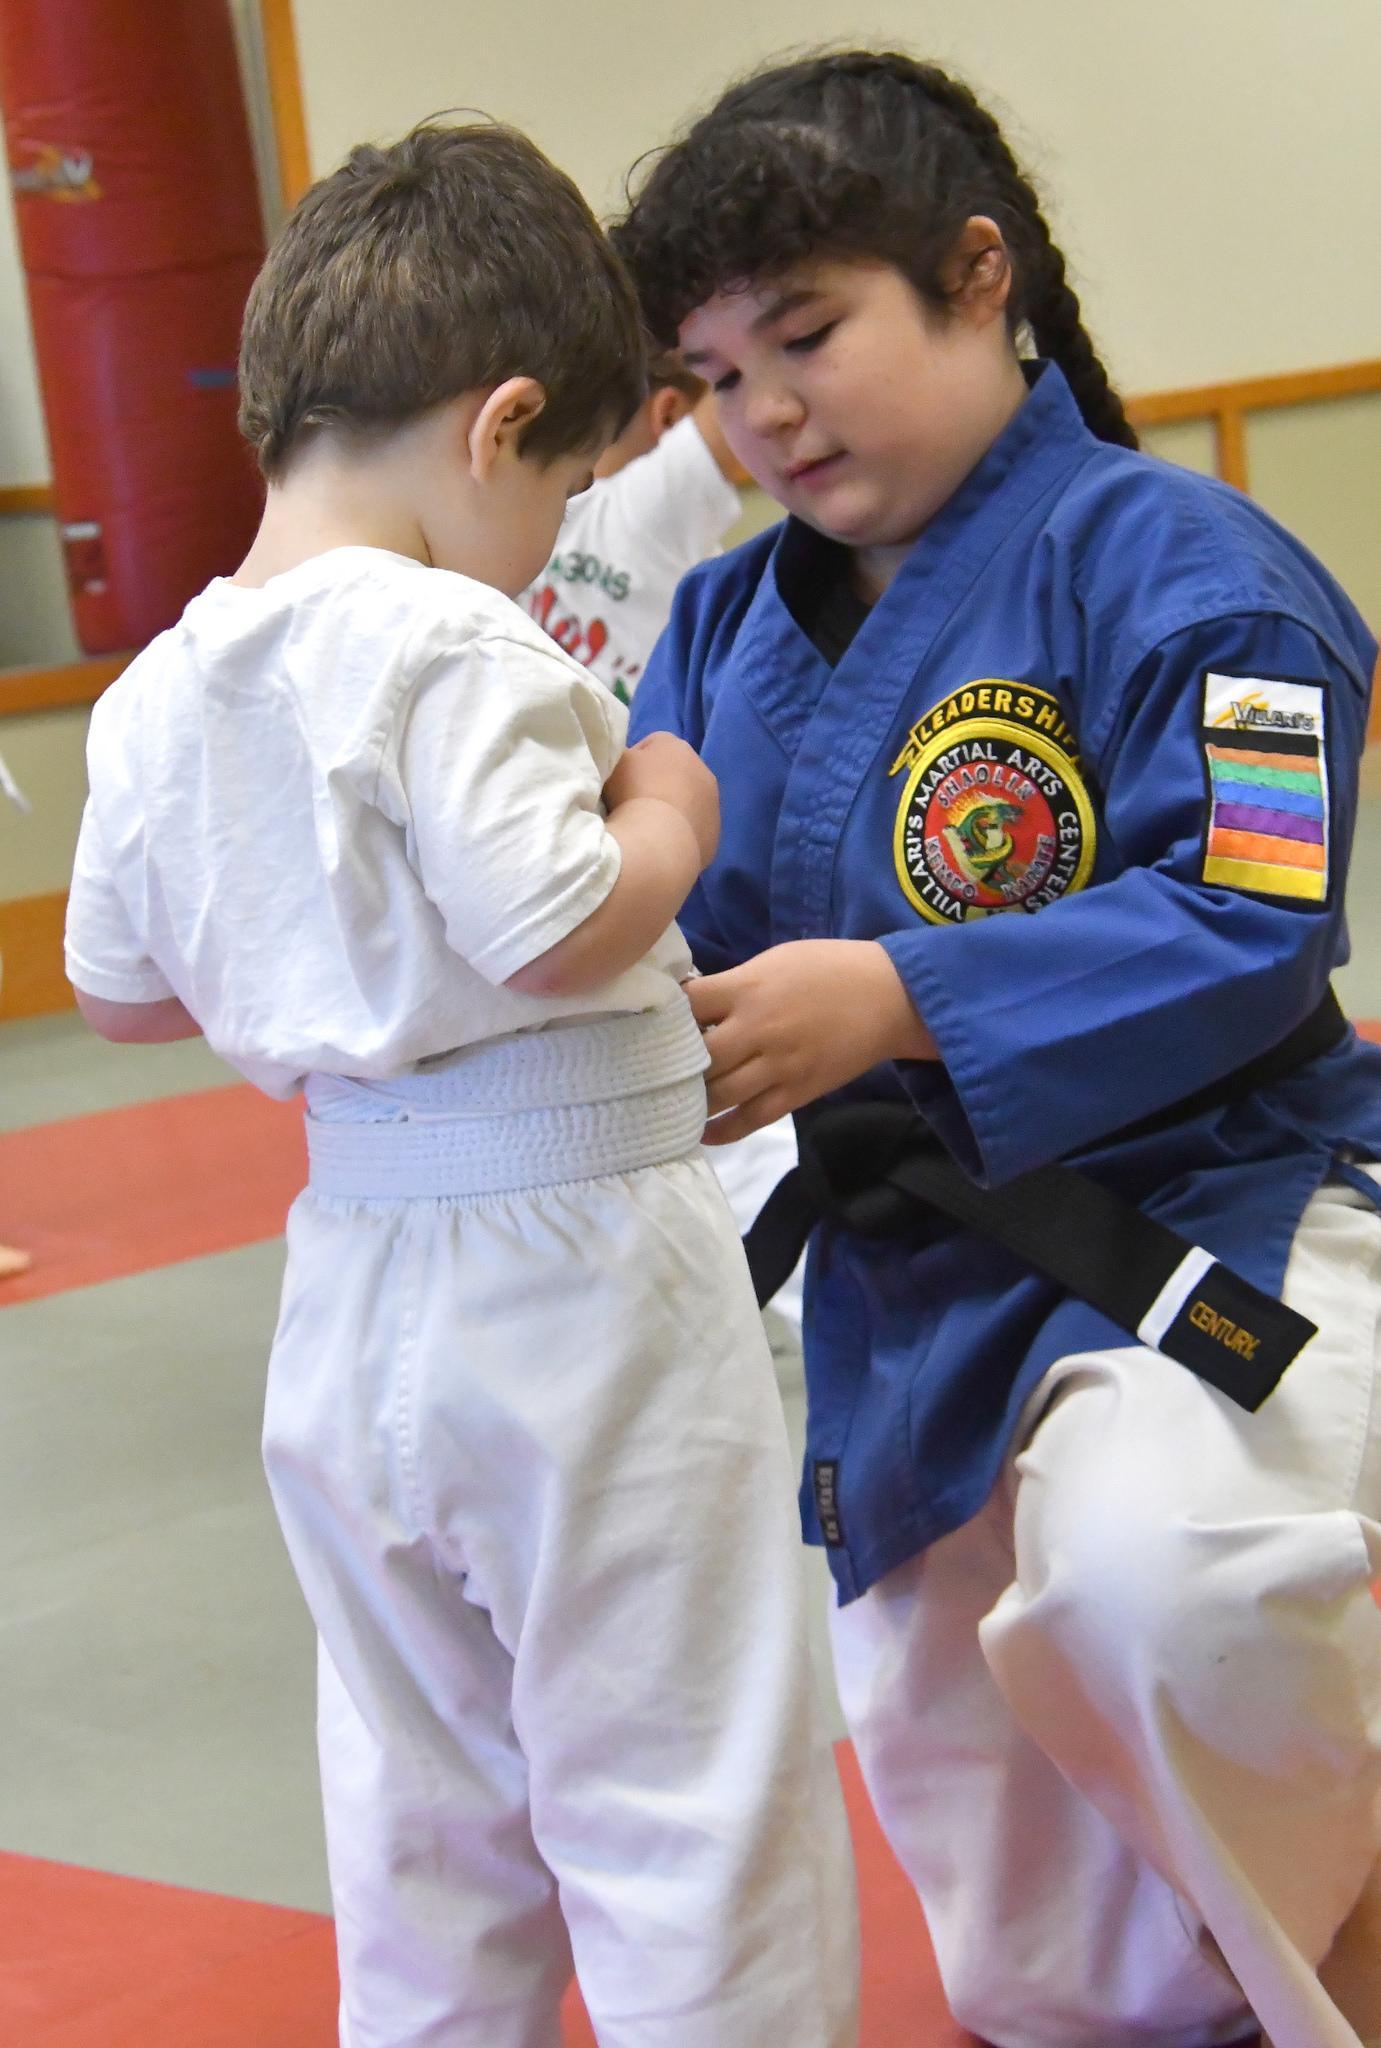 Karate Kids Classes in Connecticut | Villari's Martial Arts Centers